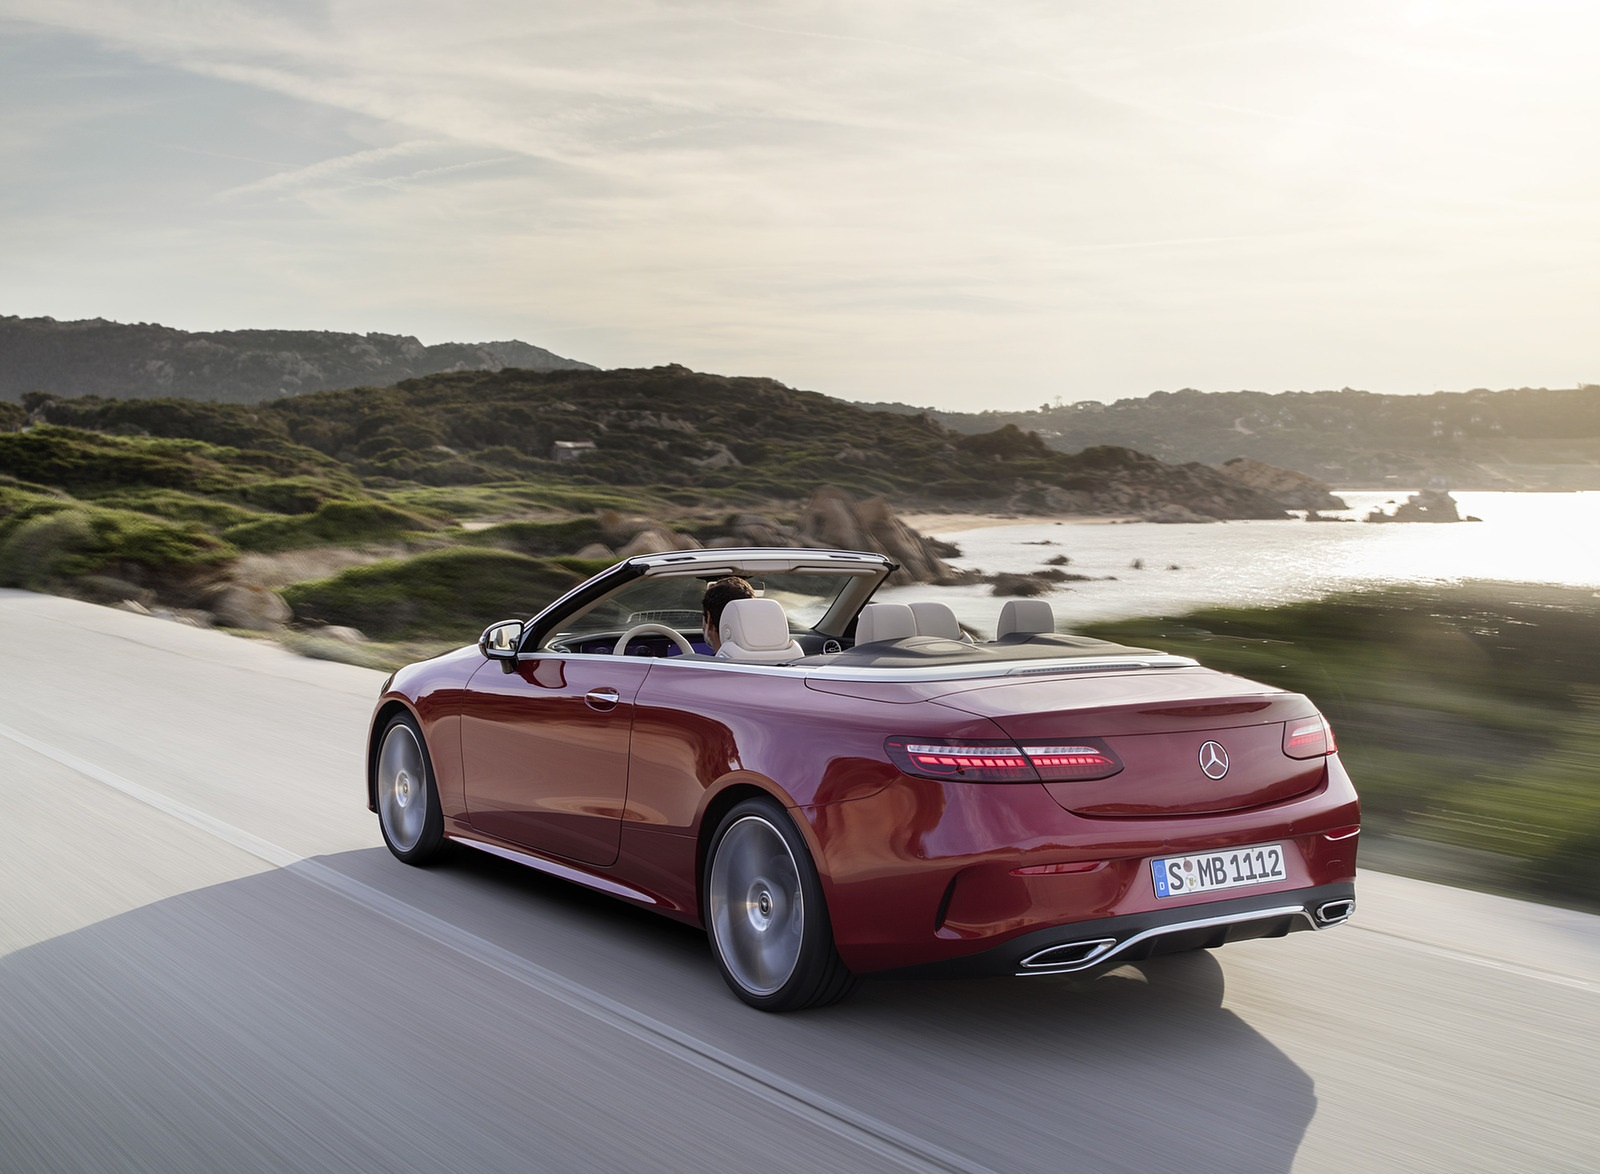 2021 Mercedes-Benz E 450 4MATIC Cabriolet AMG Line (Color: Designo Hyacinth Red Metallic) Rear Three-Quarter Wallpapers (7)